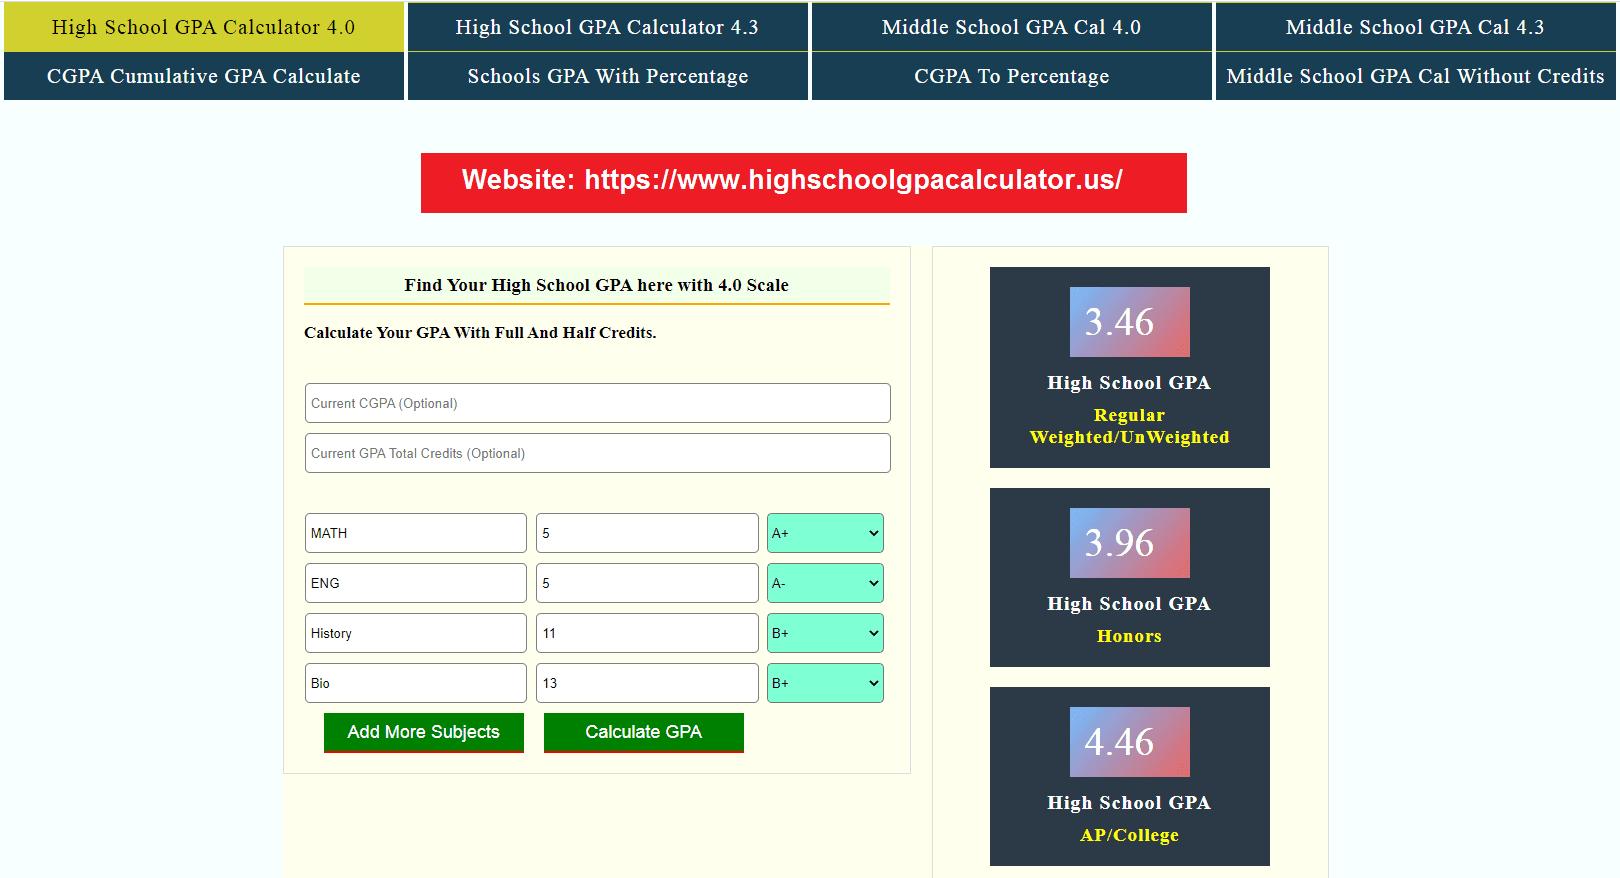 High School GPA Calculator